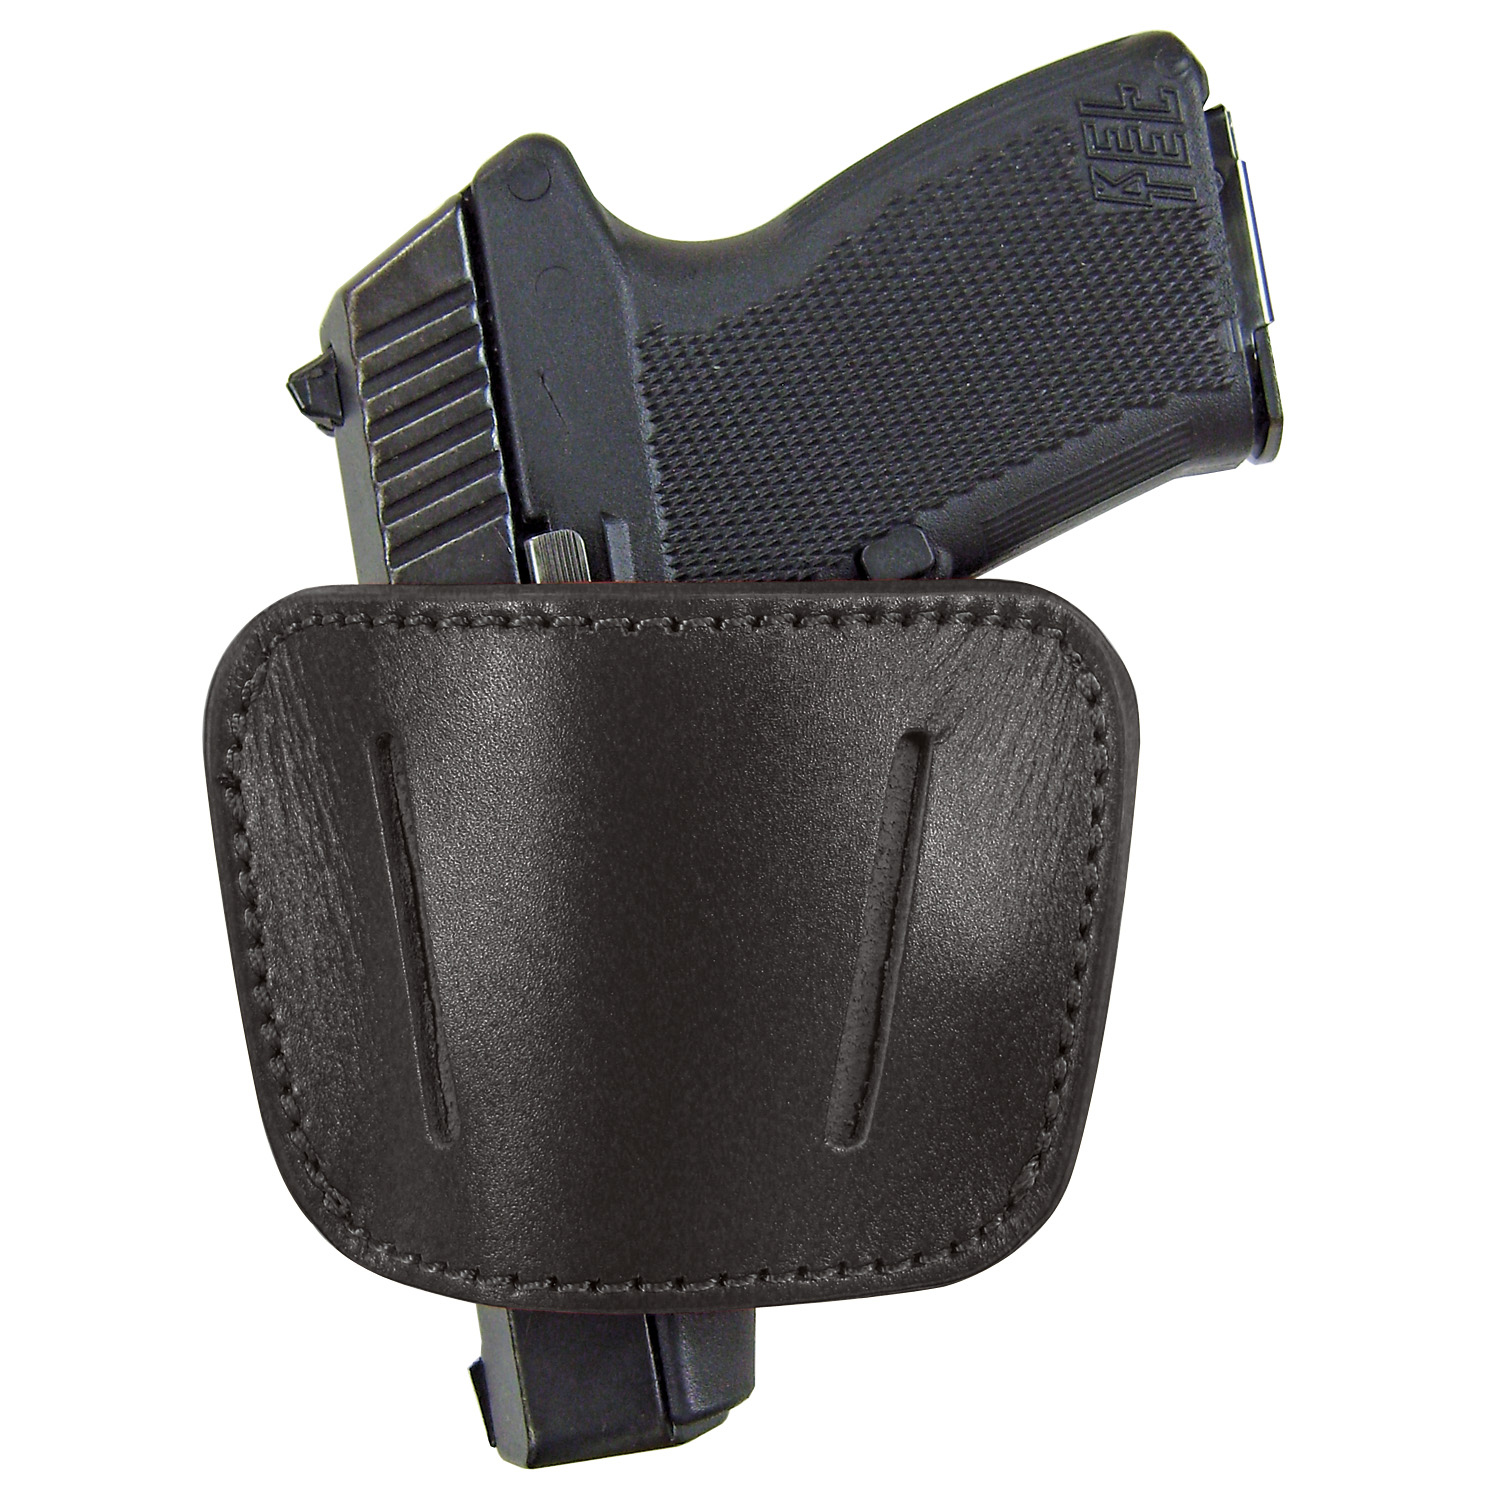 PS Products Belt Slide Holster, Black, Medium to Large Handgun